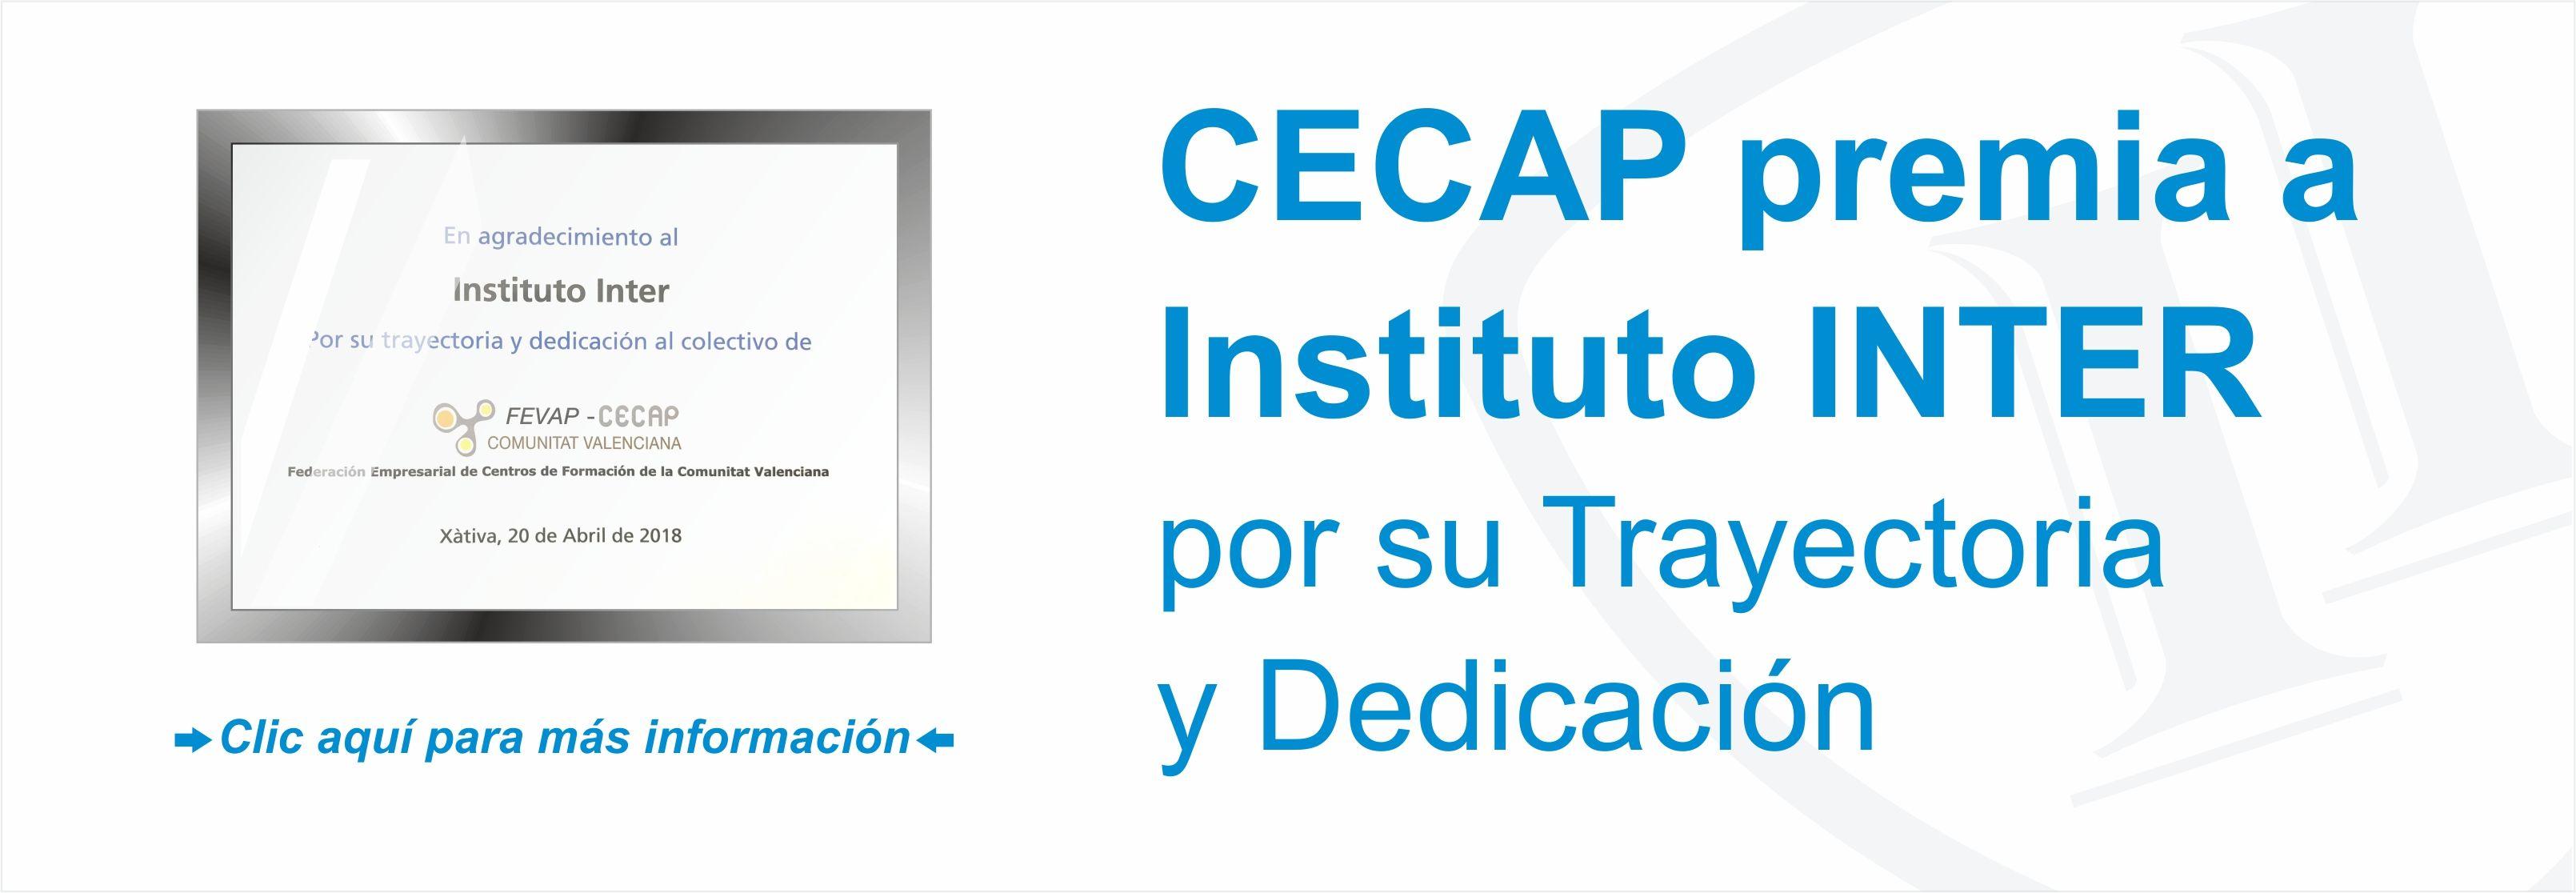 Premio-CECAP_2-compressor